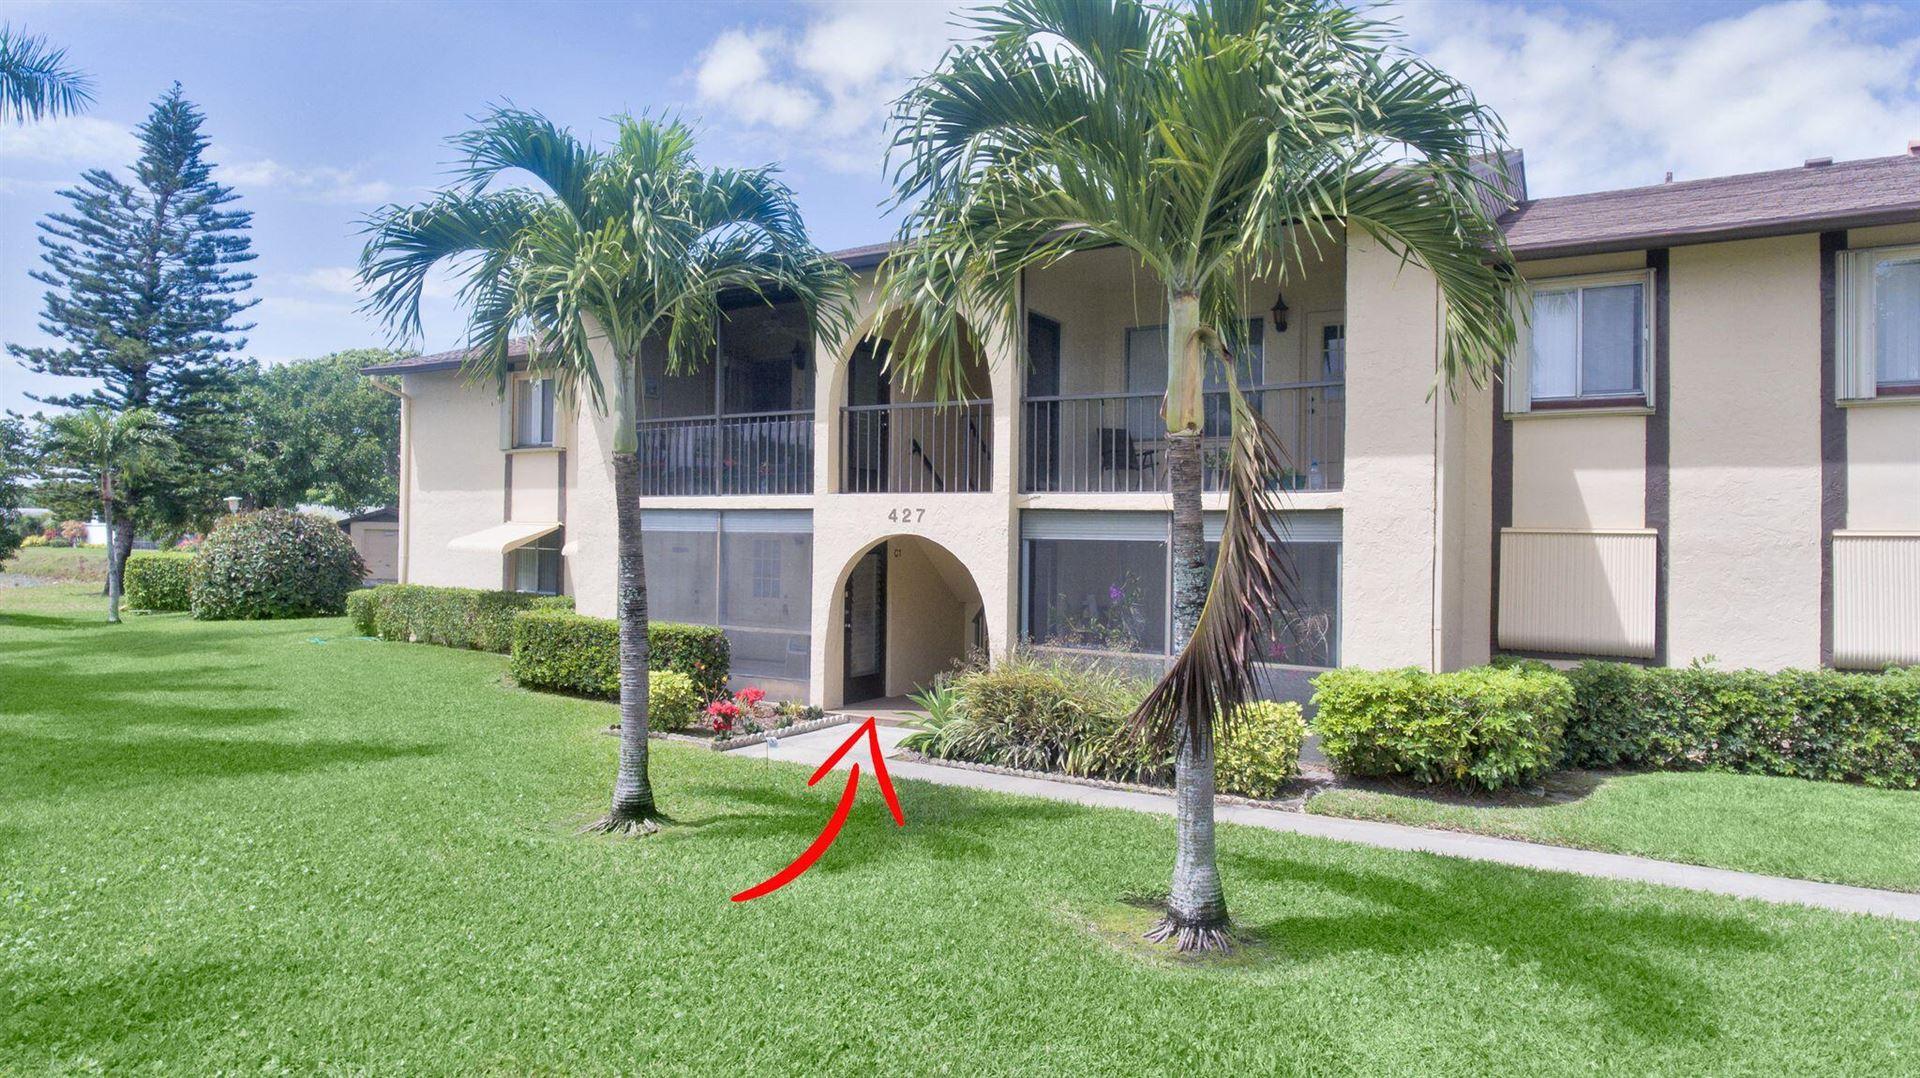 427 Pine Glen Lane #C-1, Greenacres, FL 33463 - MLS#: RX-10701910